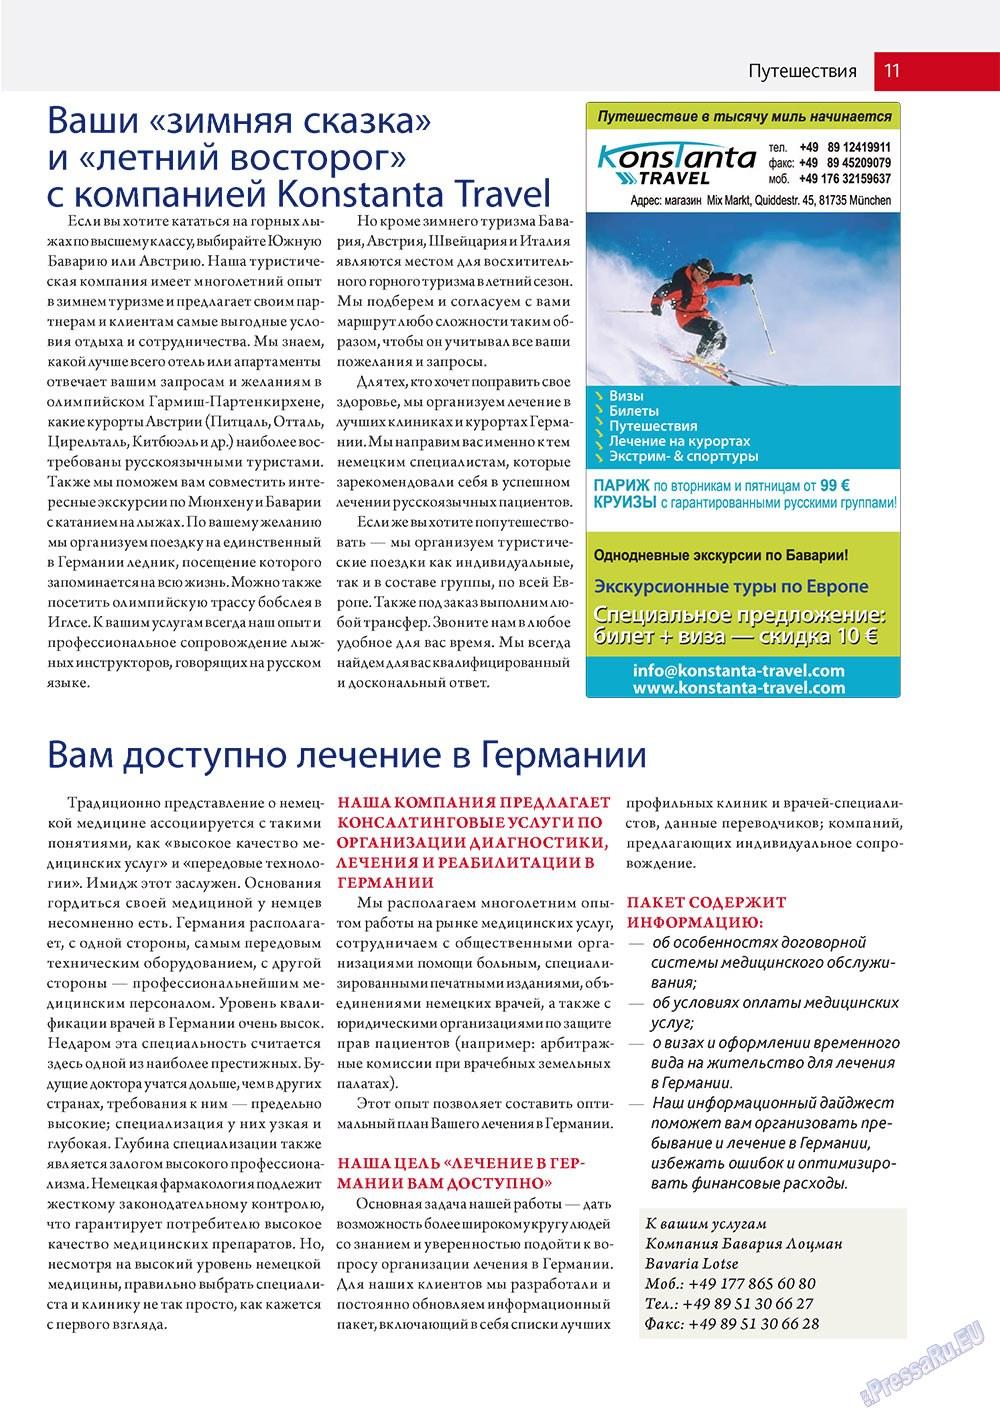 Бизнес парк (журнал). 2010 год, номер 3, стр. 11